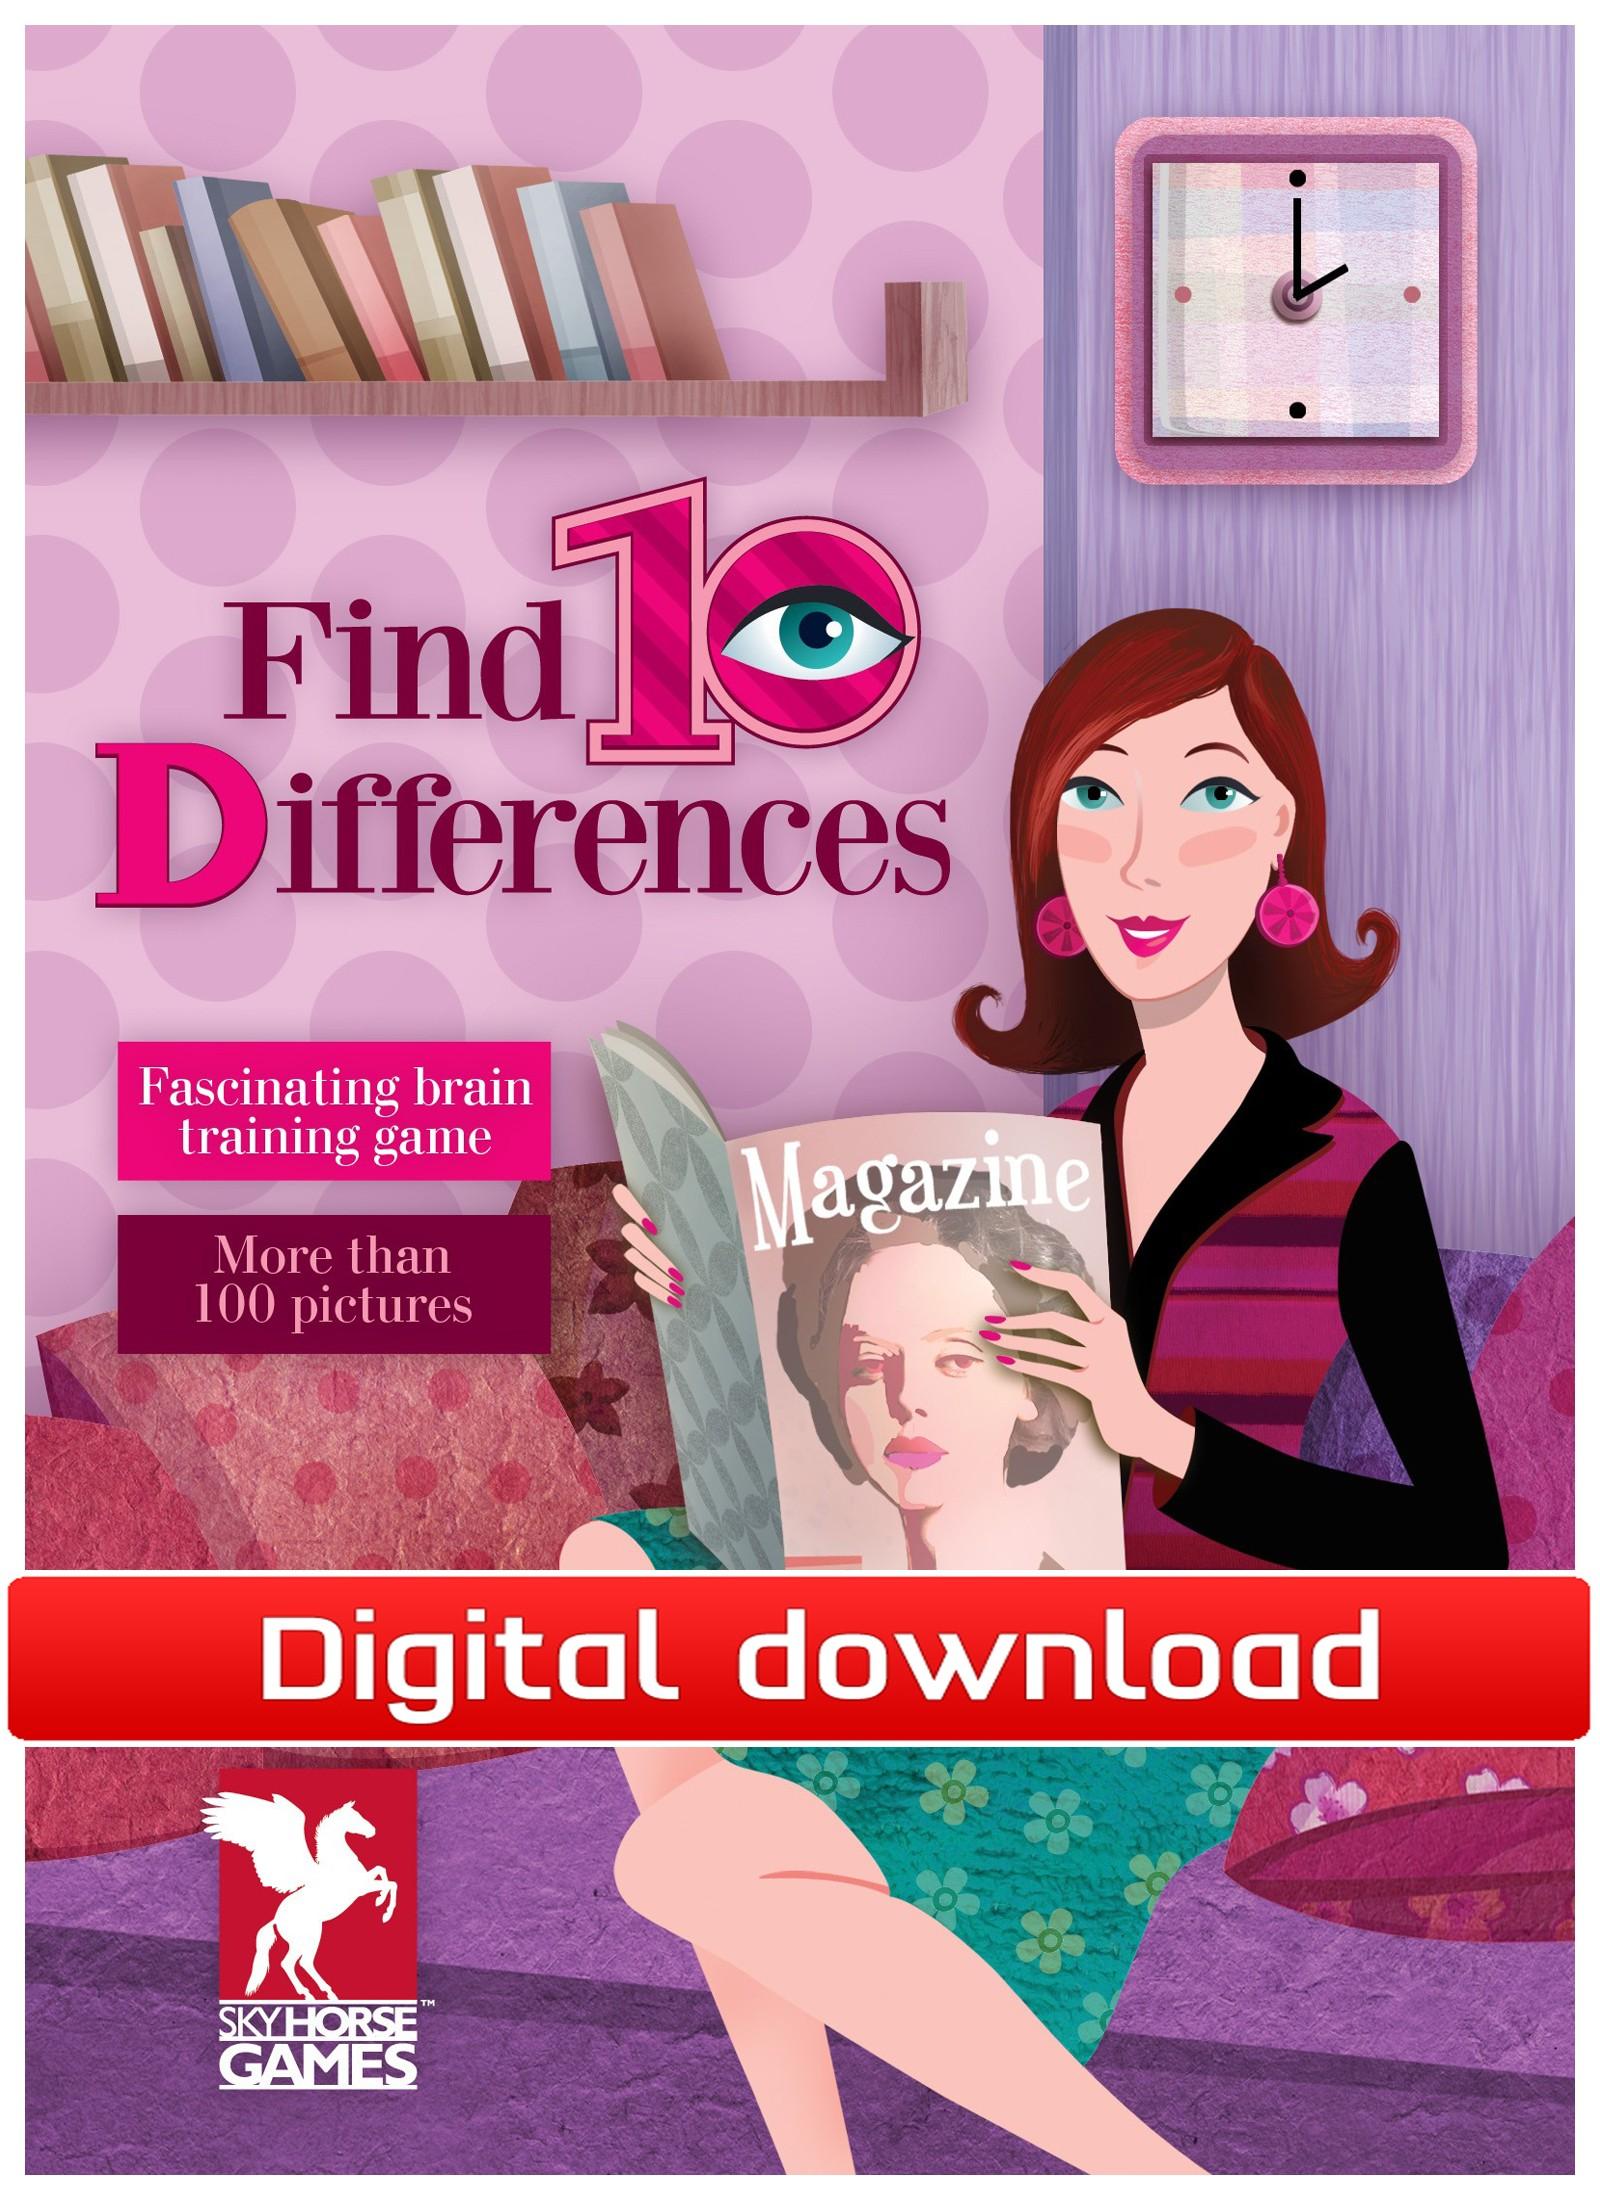 Find 10 Differences (PC nedlastning) PCDD25369